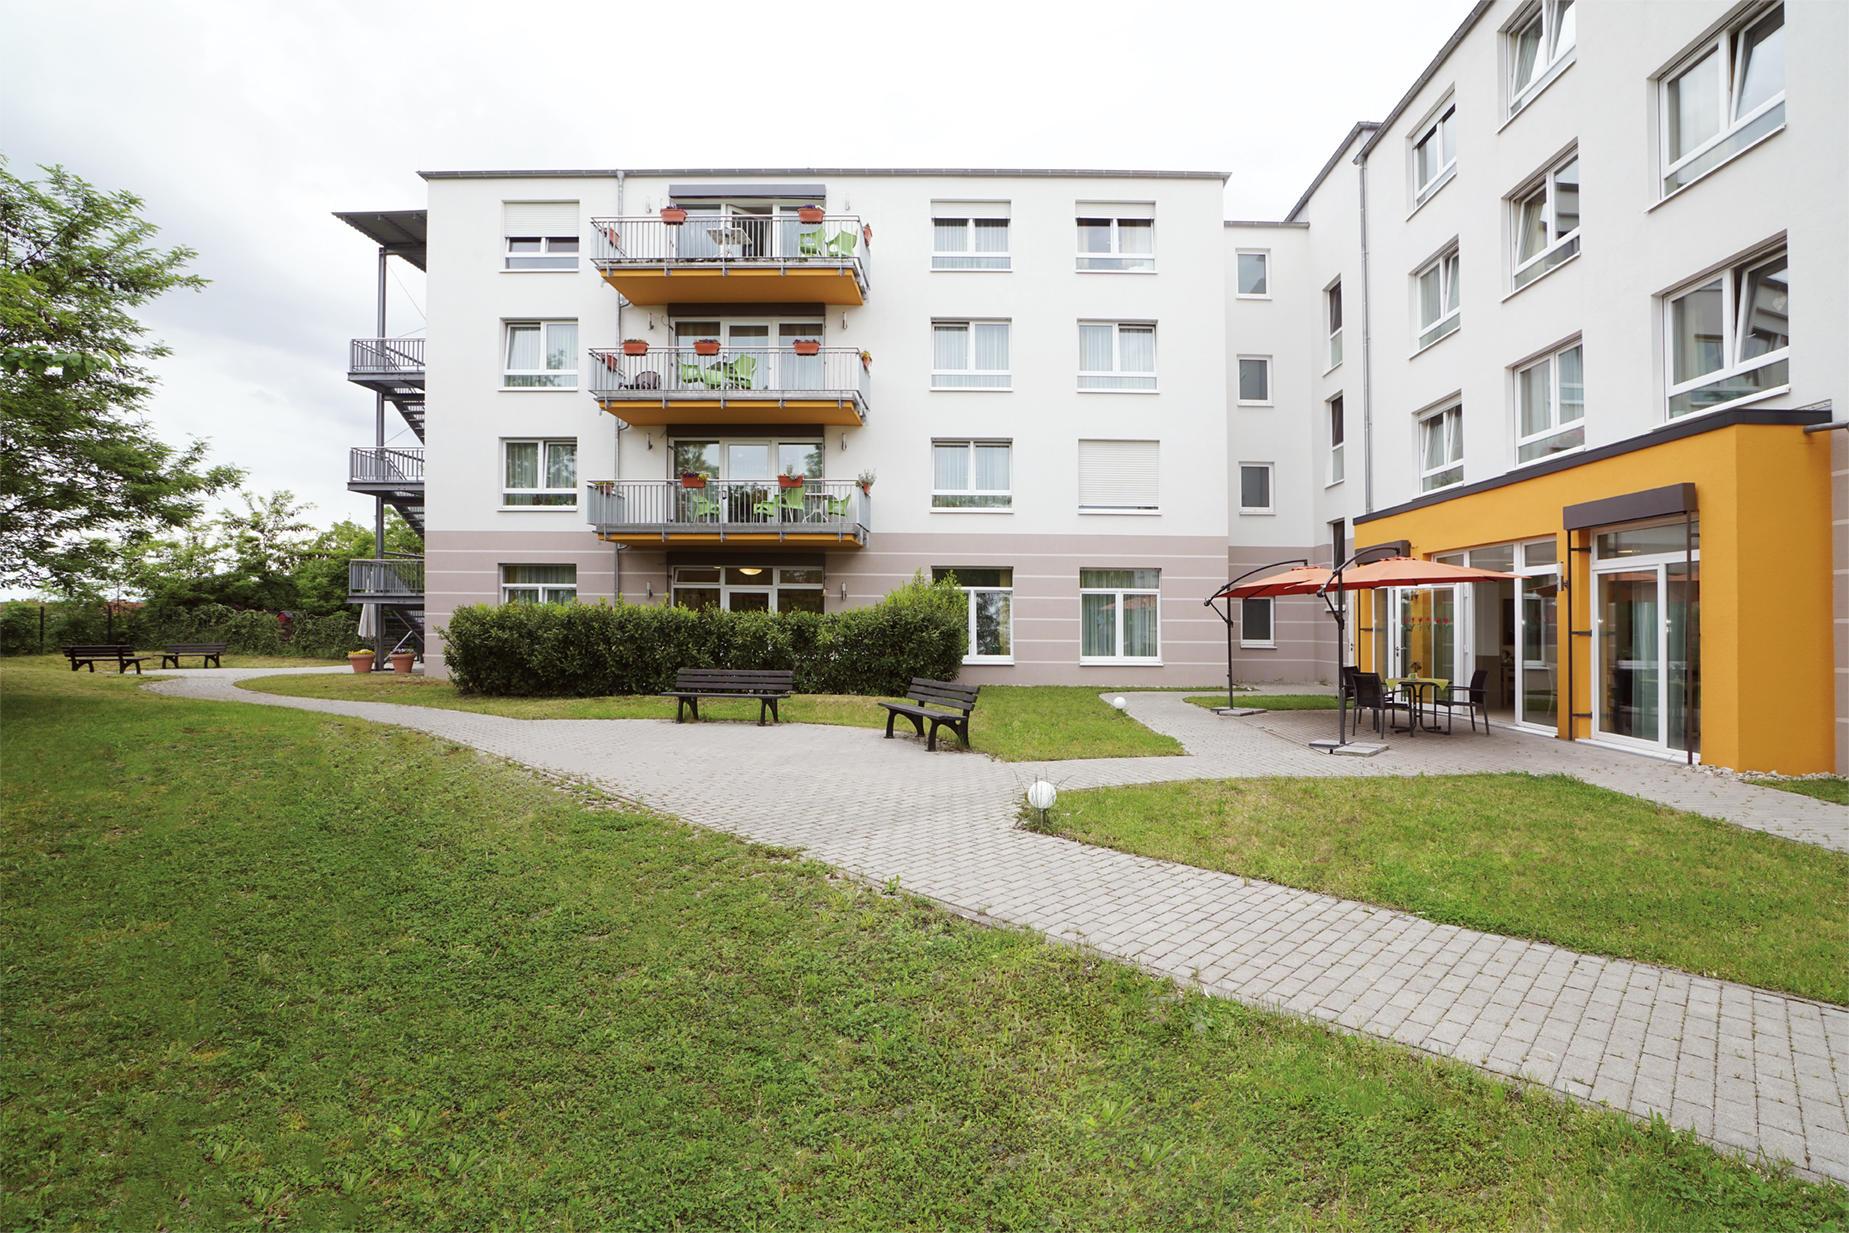 Haus Edelberg Senioren-Zentrum Saarbrücken